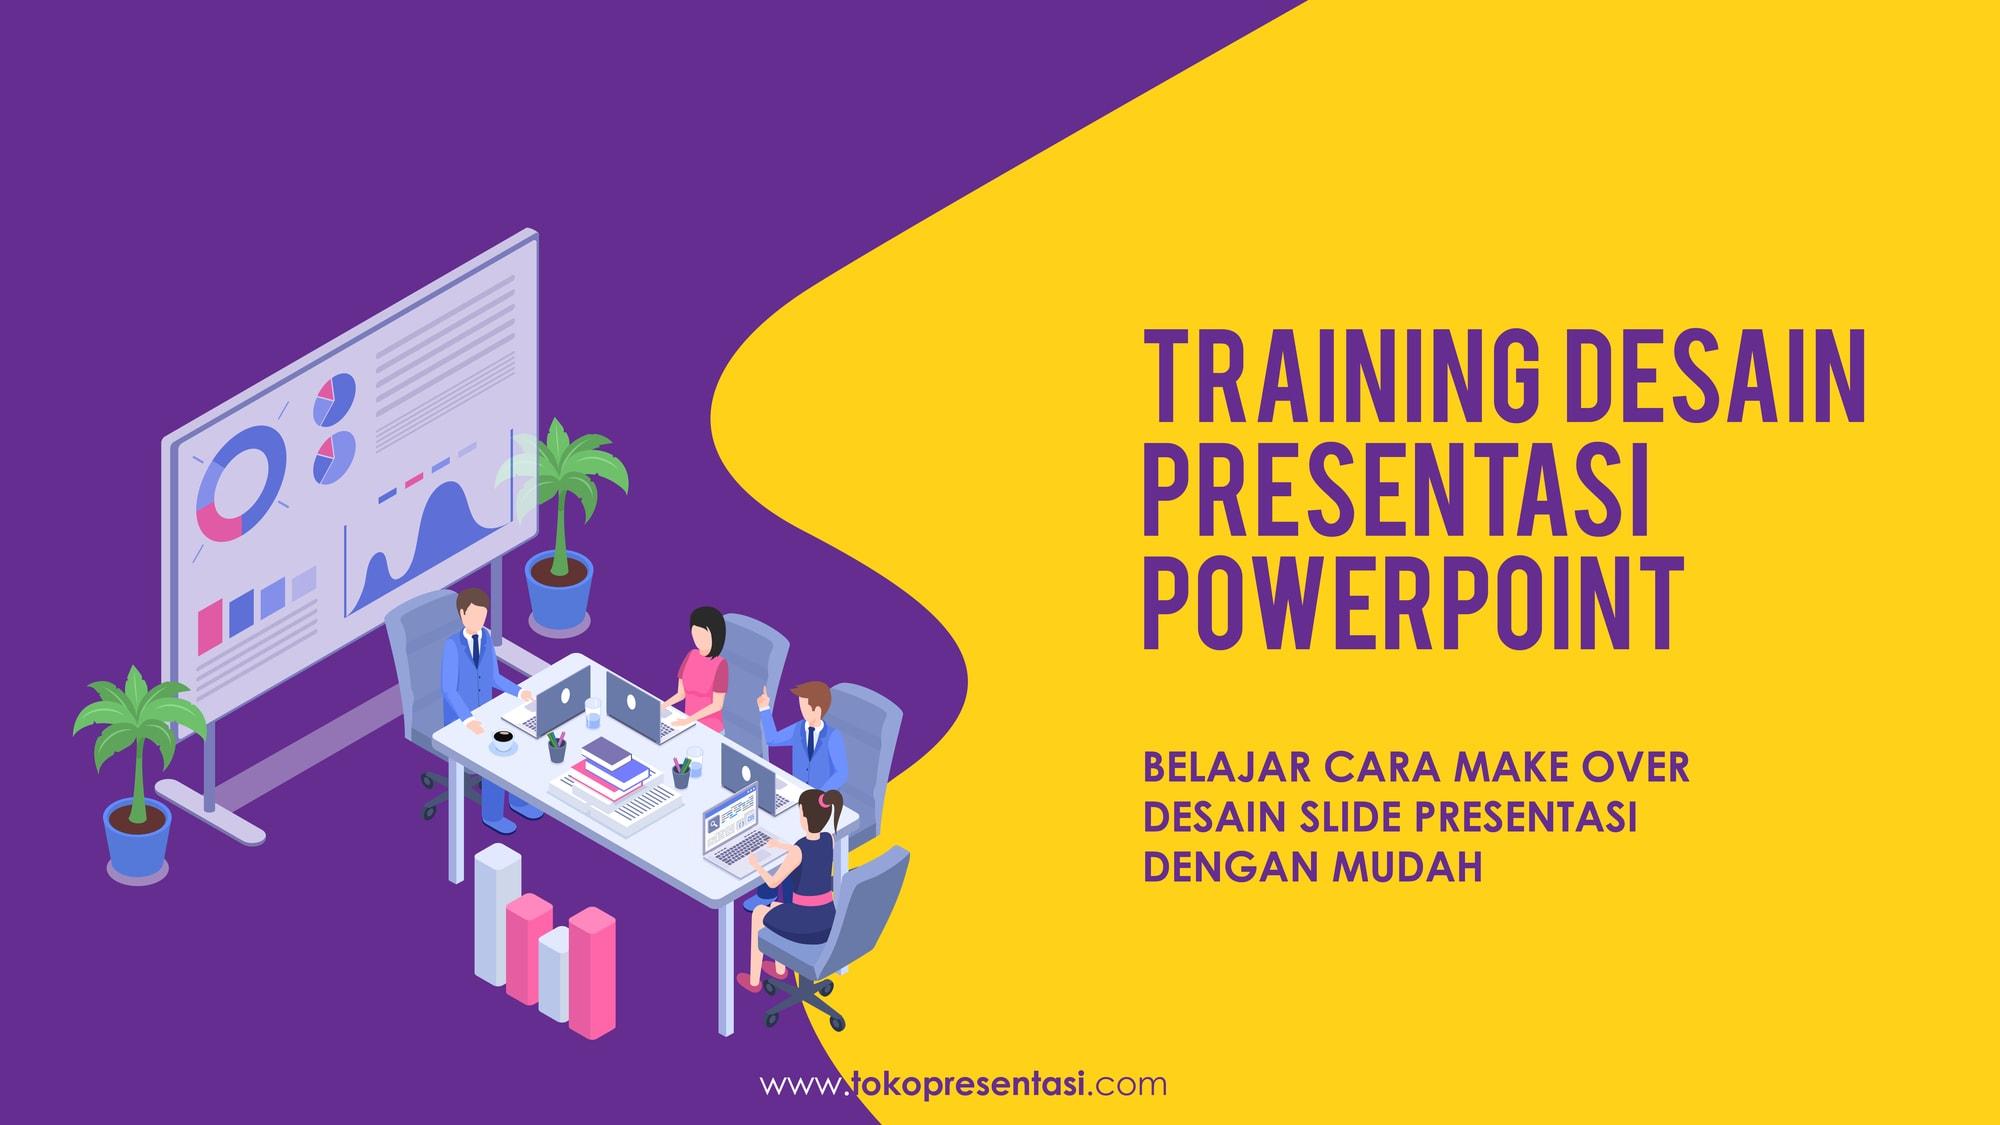 Pelatihan Desain Presentasi PowerPoint Komisi Yudisial Tokopresentasi